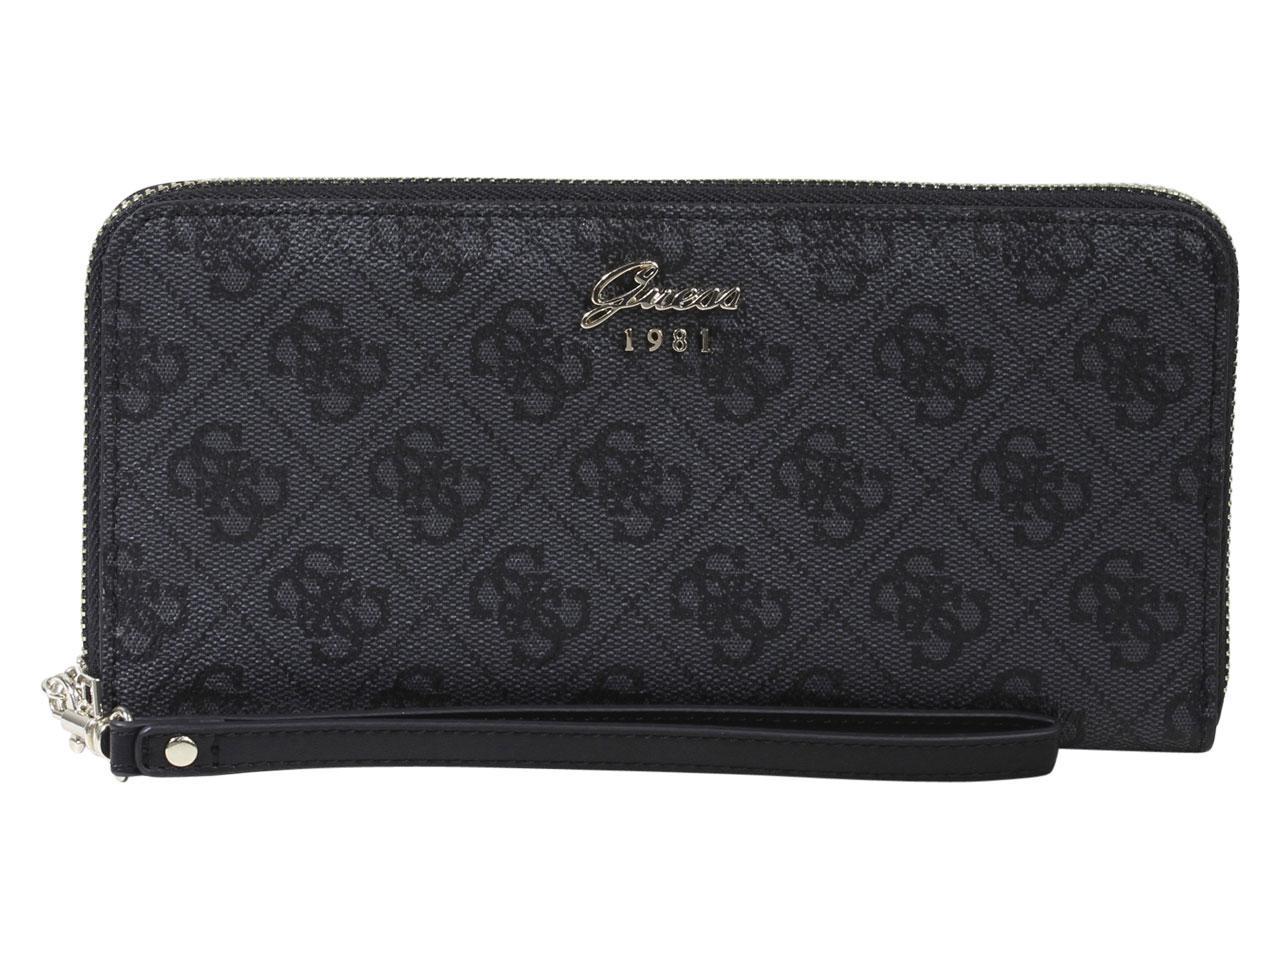 Guess Women's Jacqui Large Zip-Around Clutch Wallet